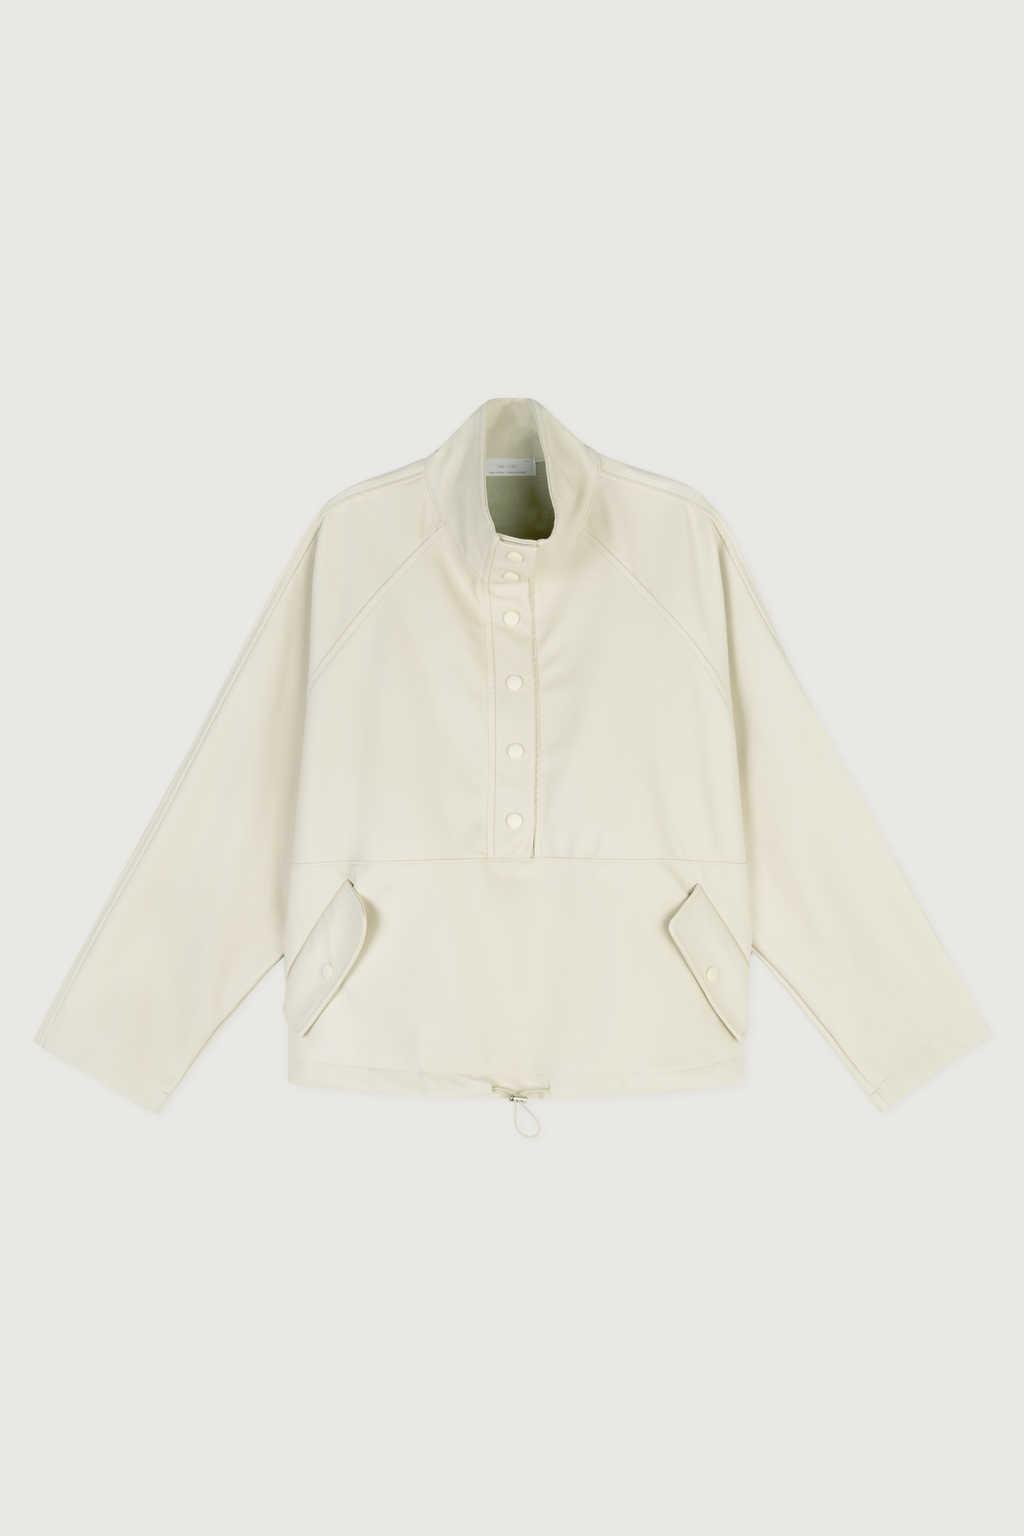 Jacket J001 Cream 5